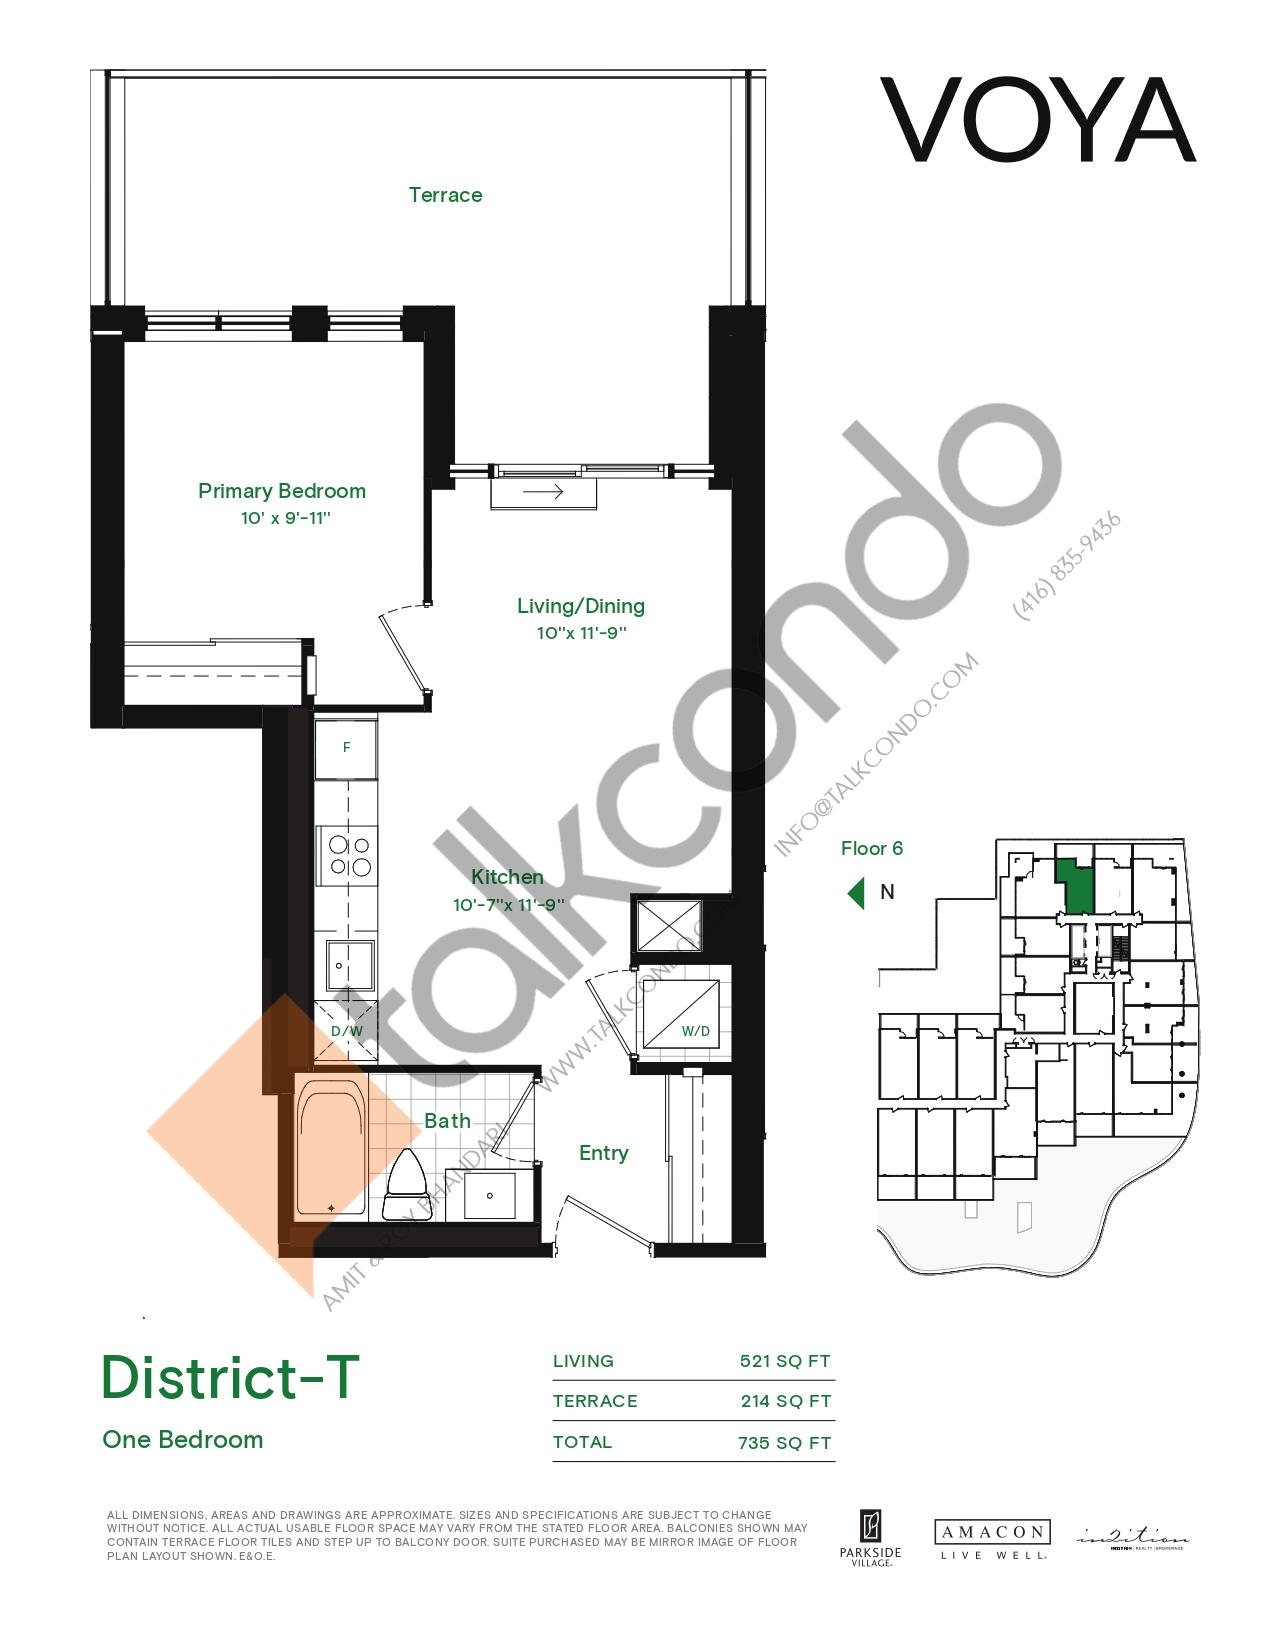 District-T (Podium) Floor Plan at Voya at Parkside Village Condos - 521 sq.ft